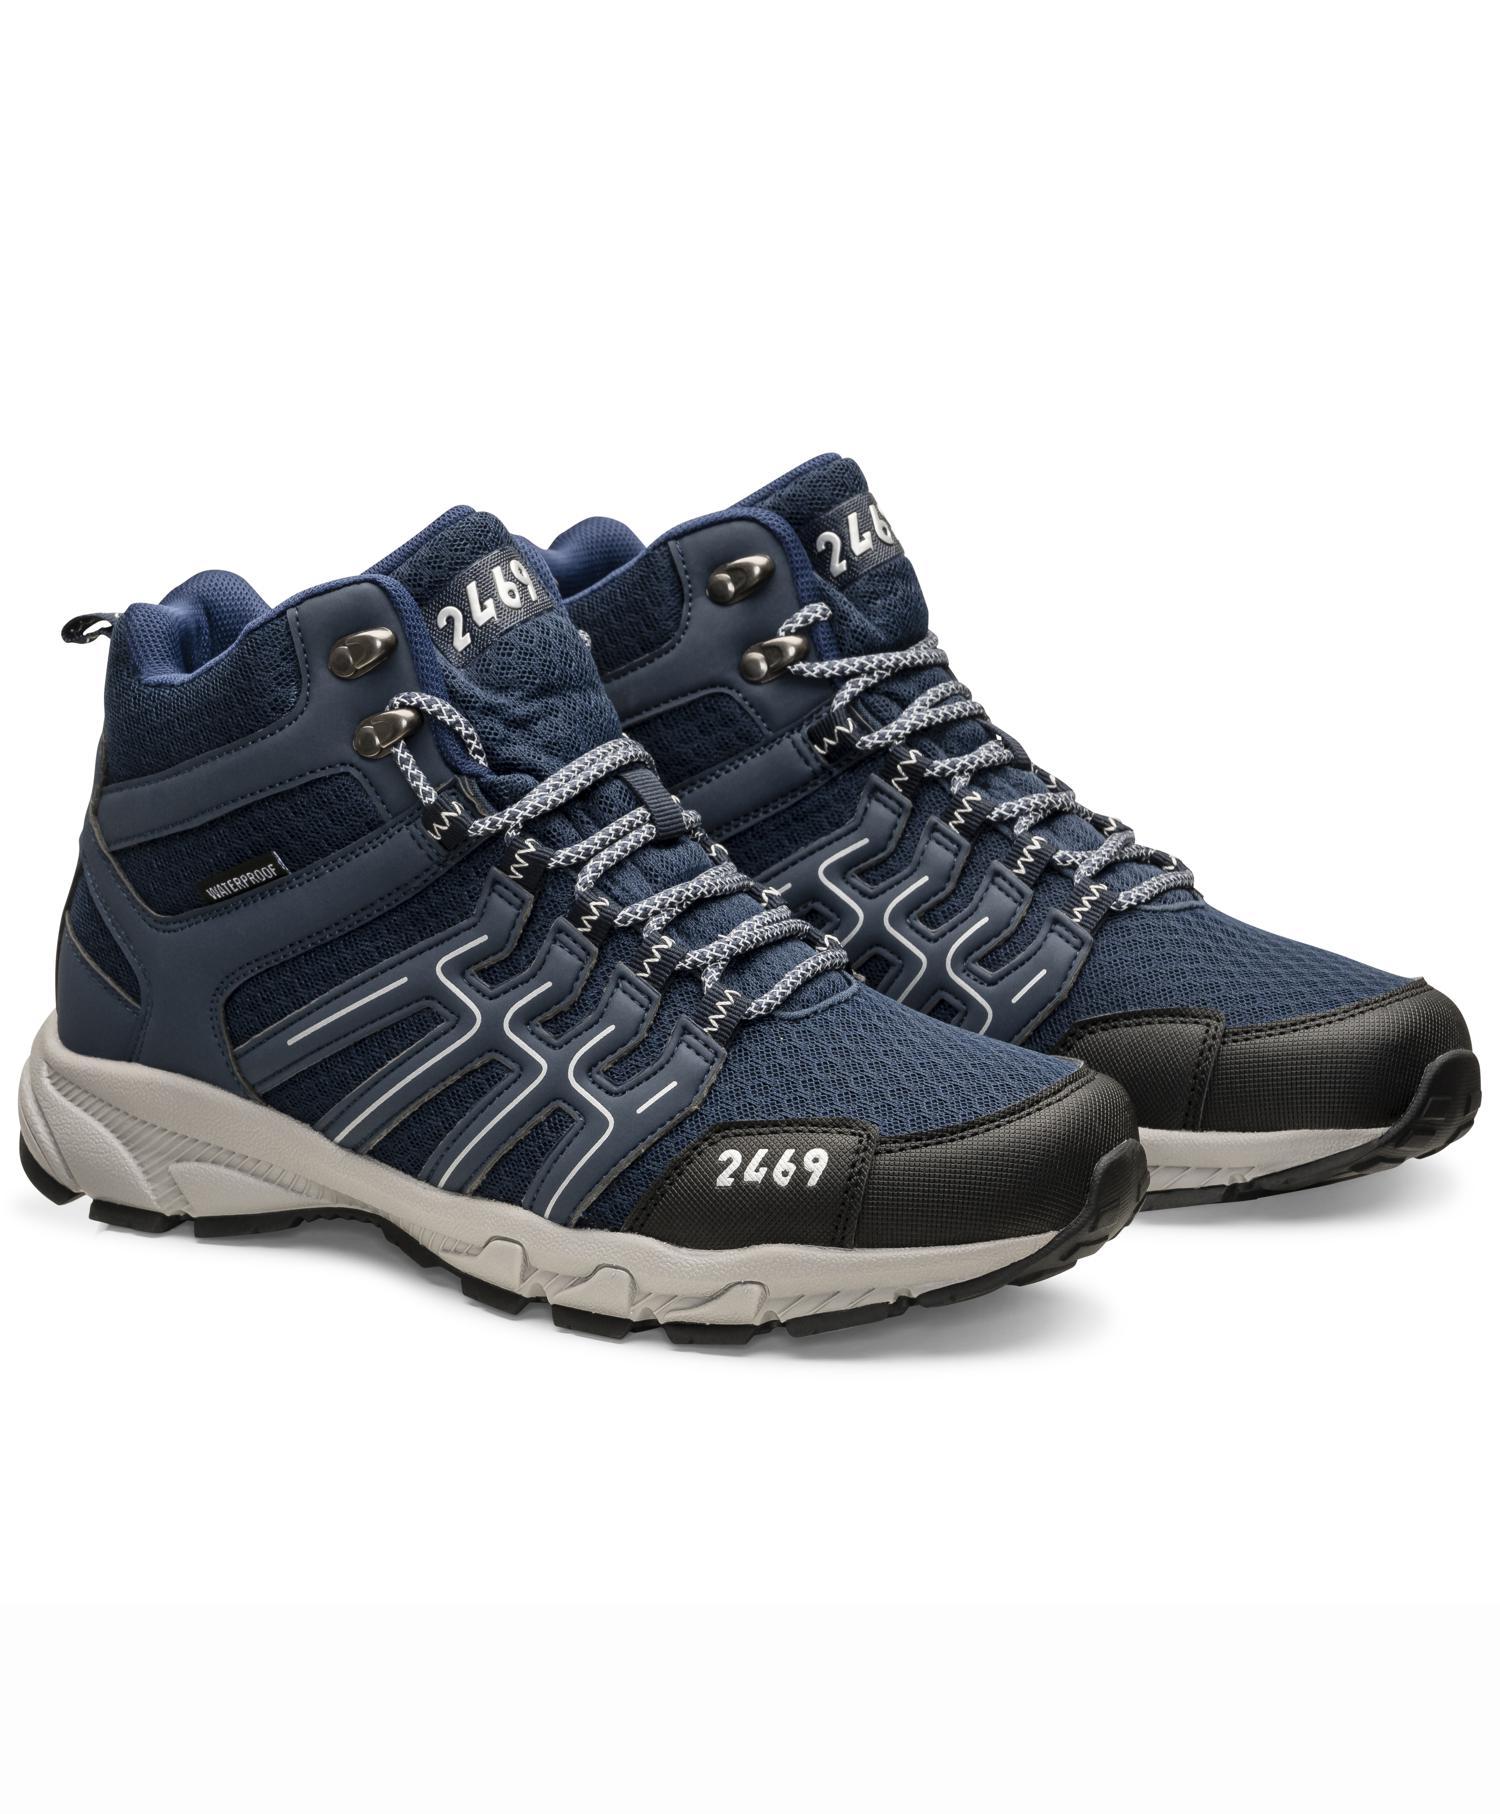 2469 Hiker Midcut